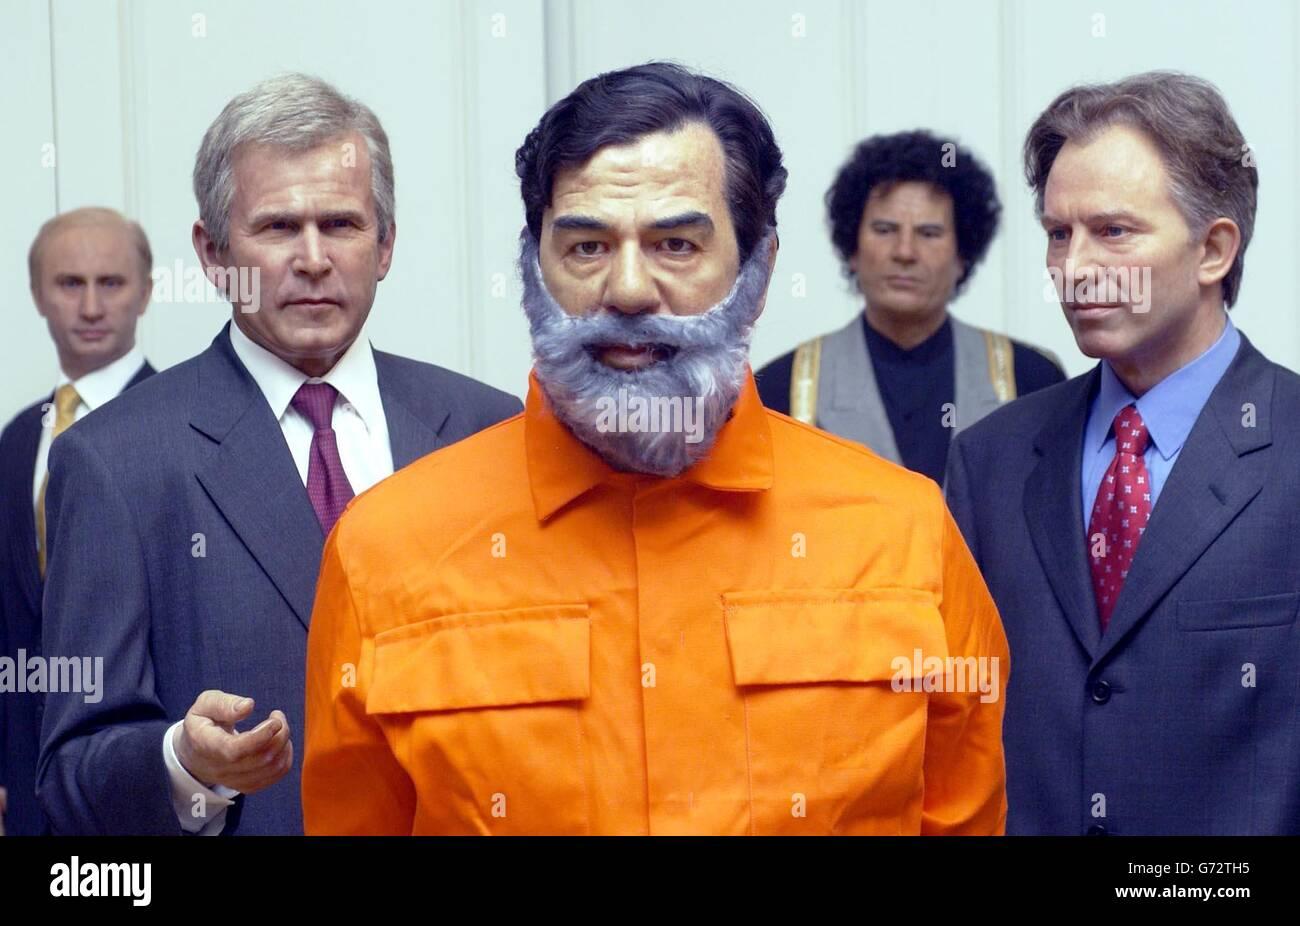 Saddam Hussein waxwork - Stock Image